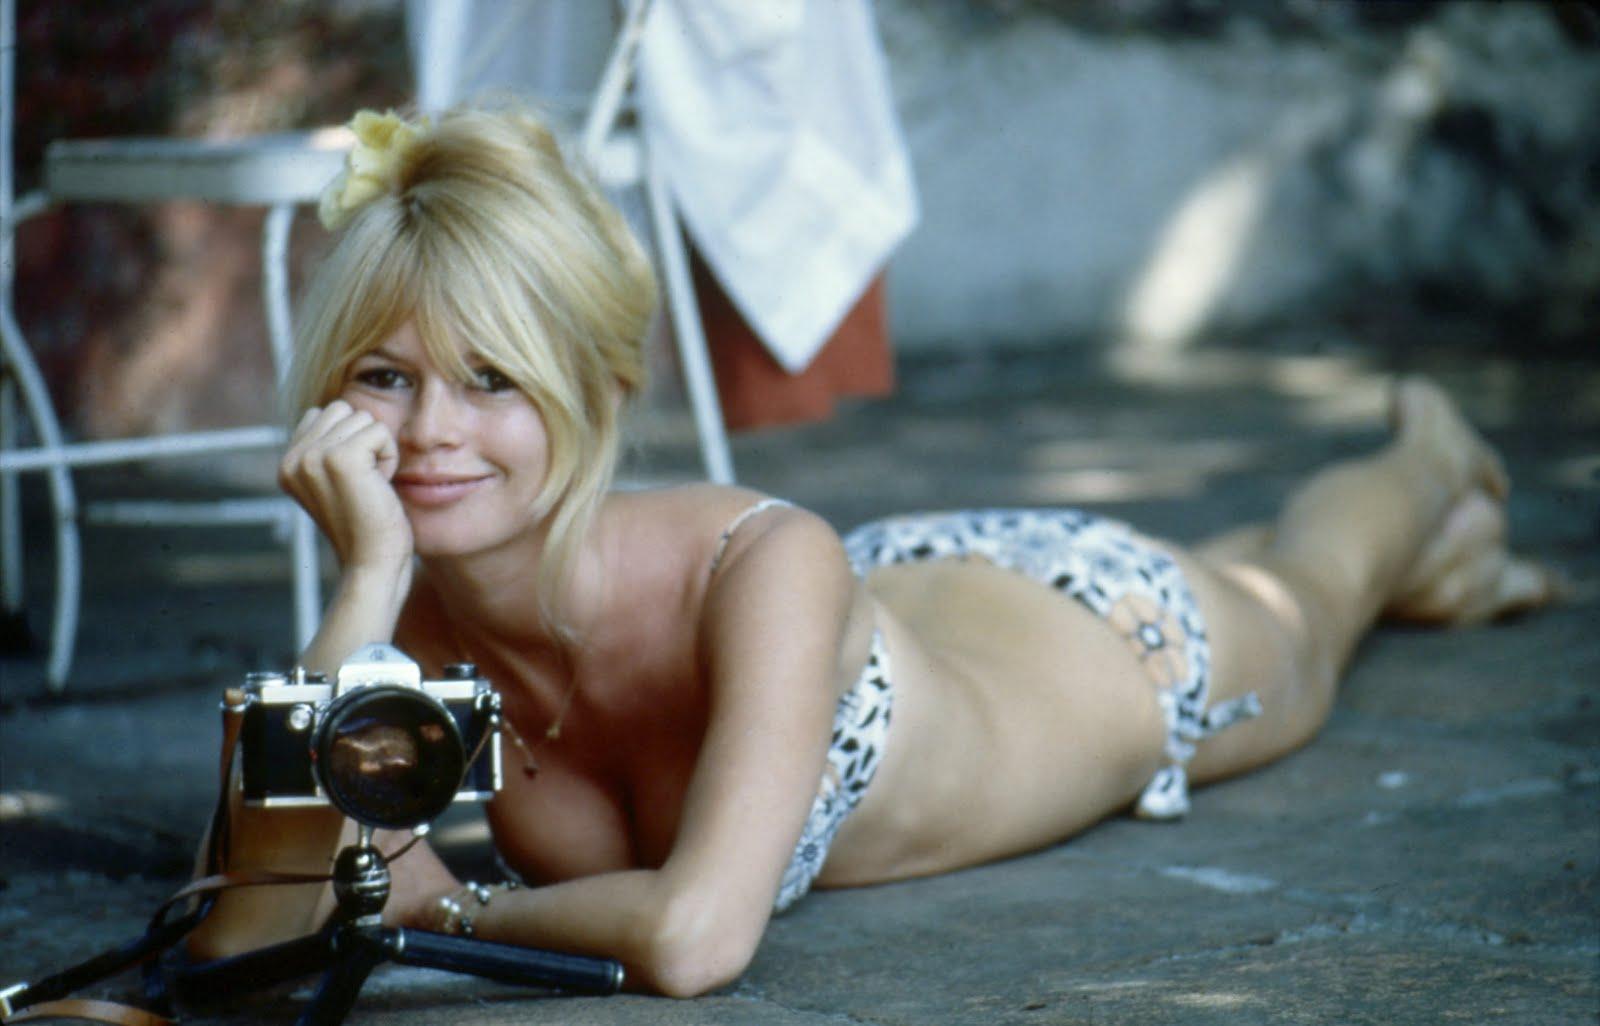 http://3.bp.blogspot.com/_yavP5M_4h14/TEA4qYELdOI/AAAAAAAAA5Q/1yNf7kFNoas/s1600/Brigitte+Bardot.jpg